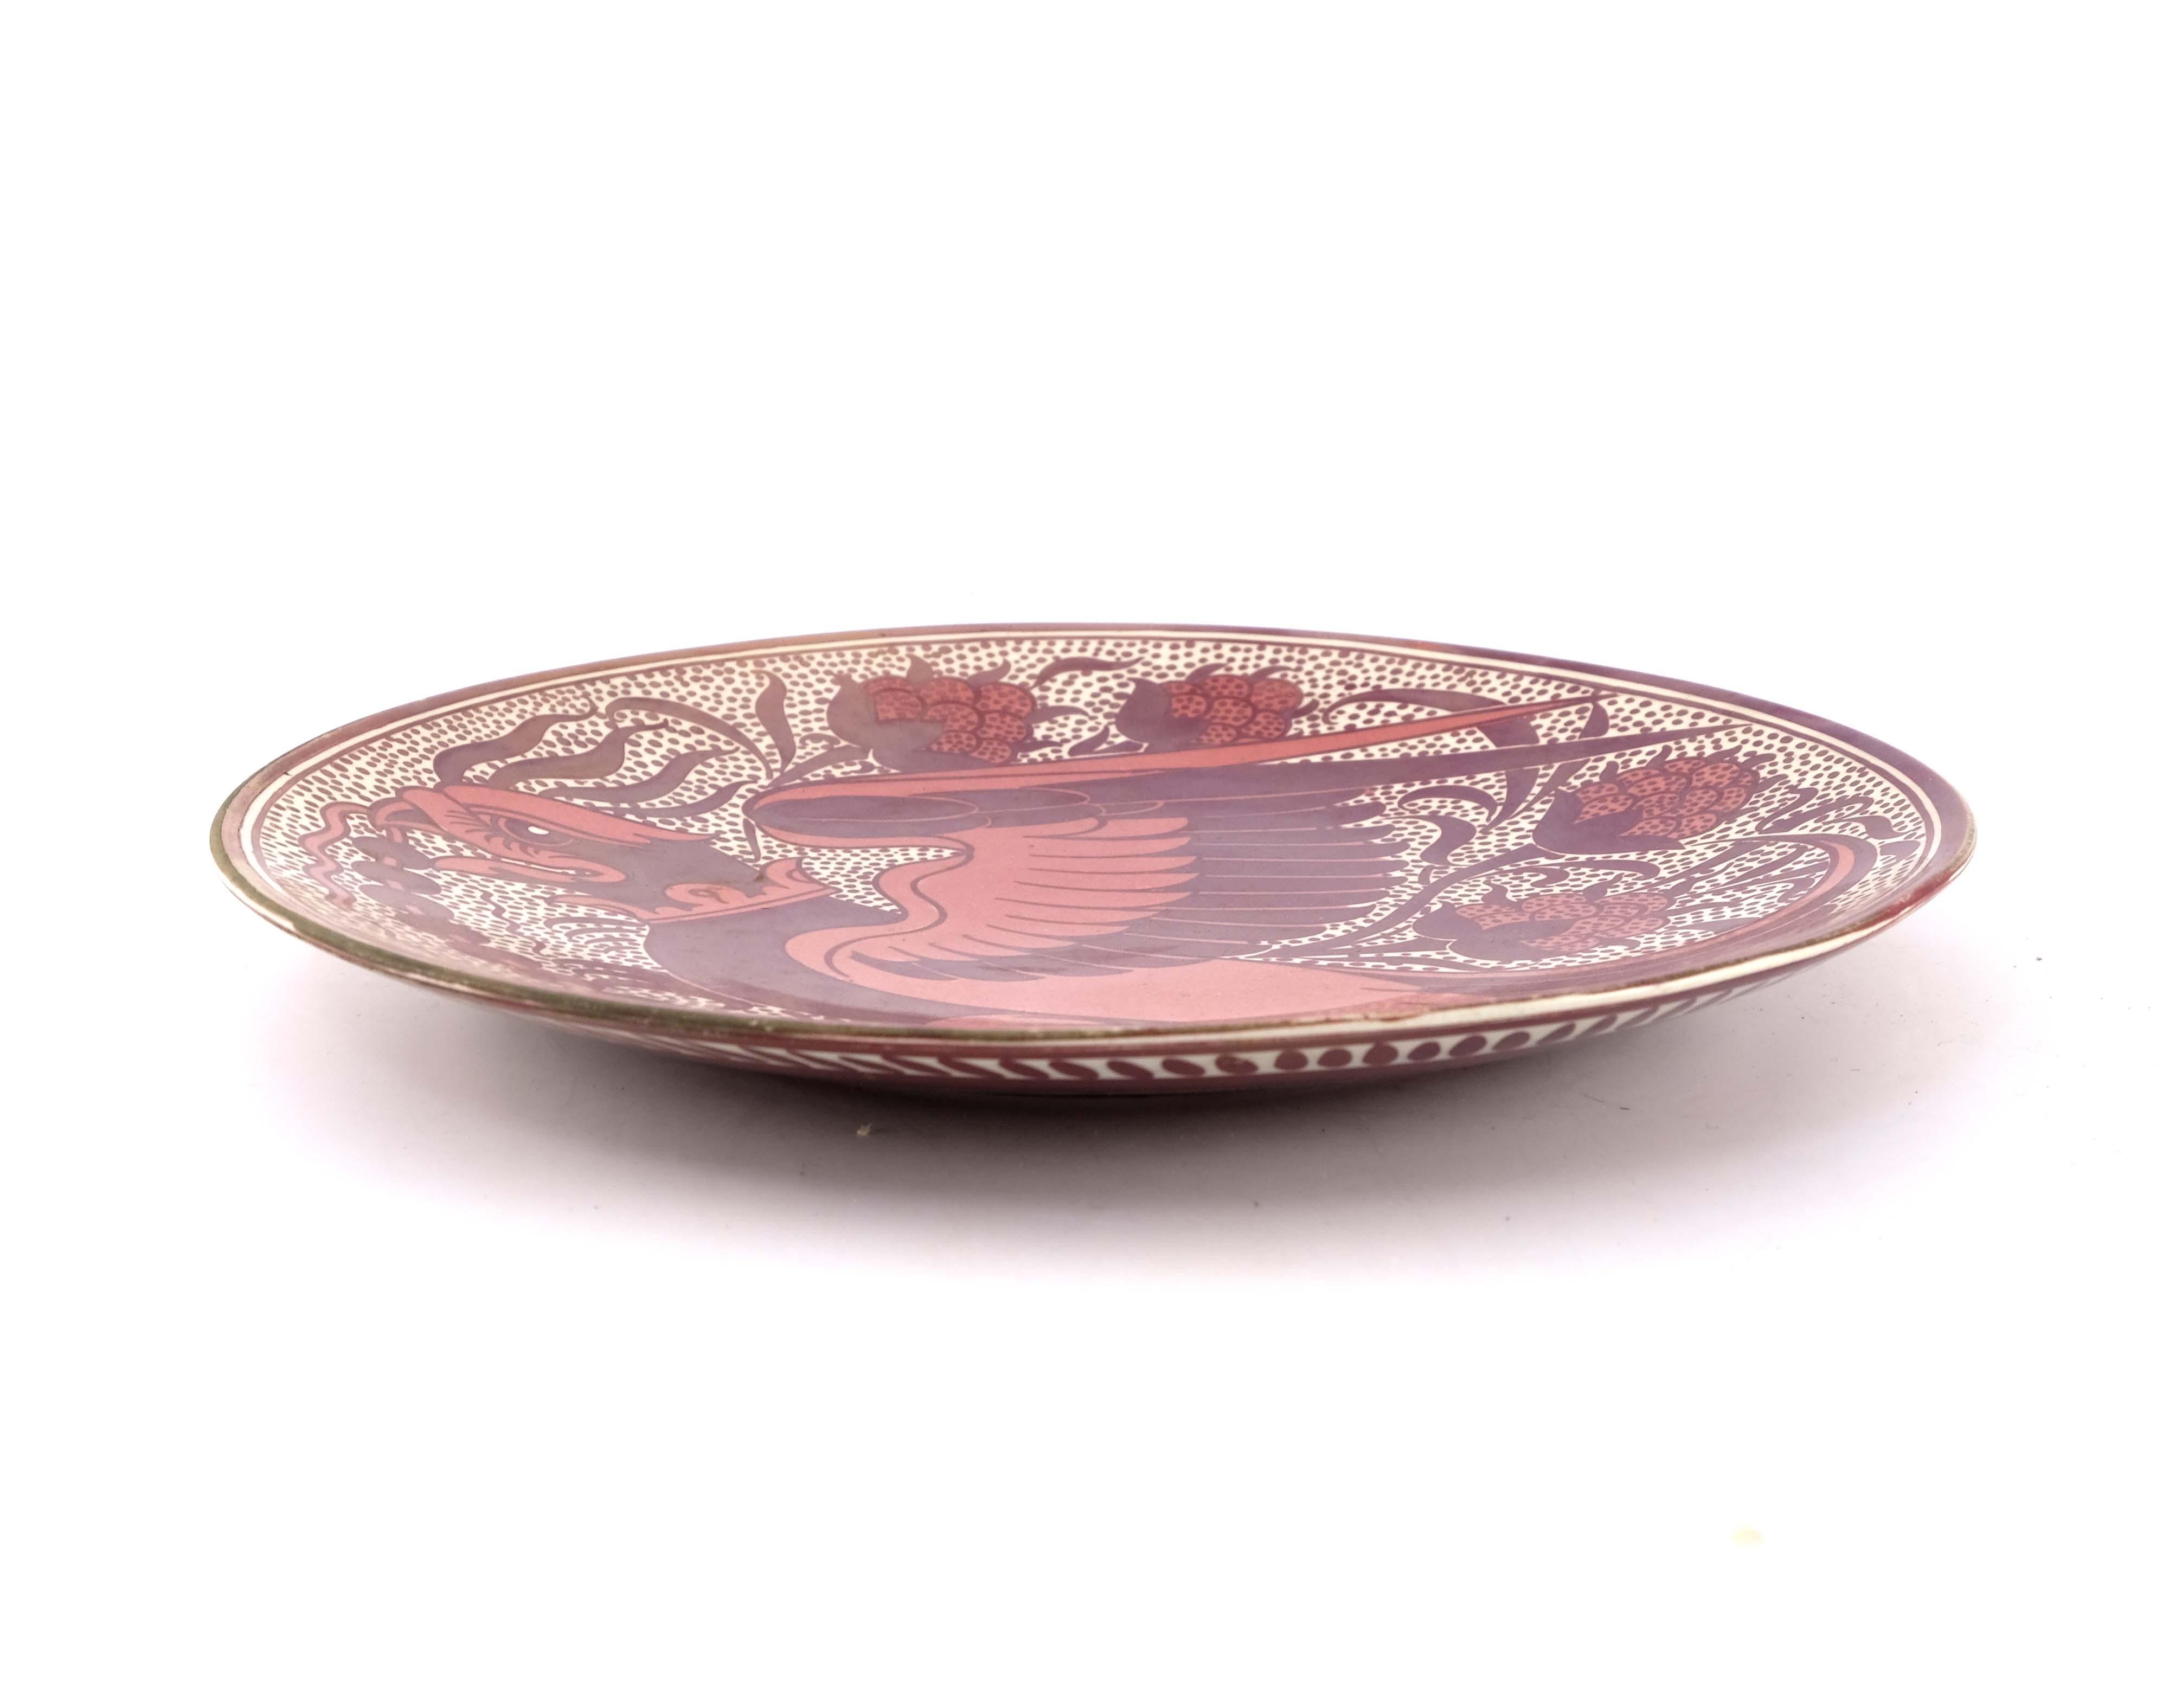 William De Morgan, a lustre plate - Image 2 of 3